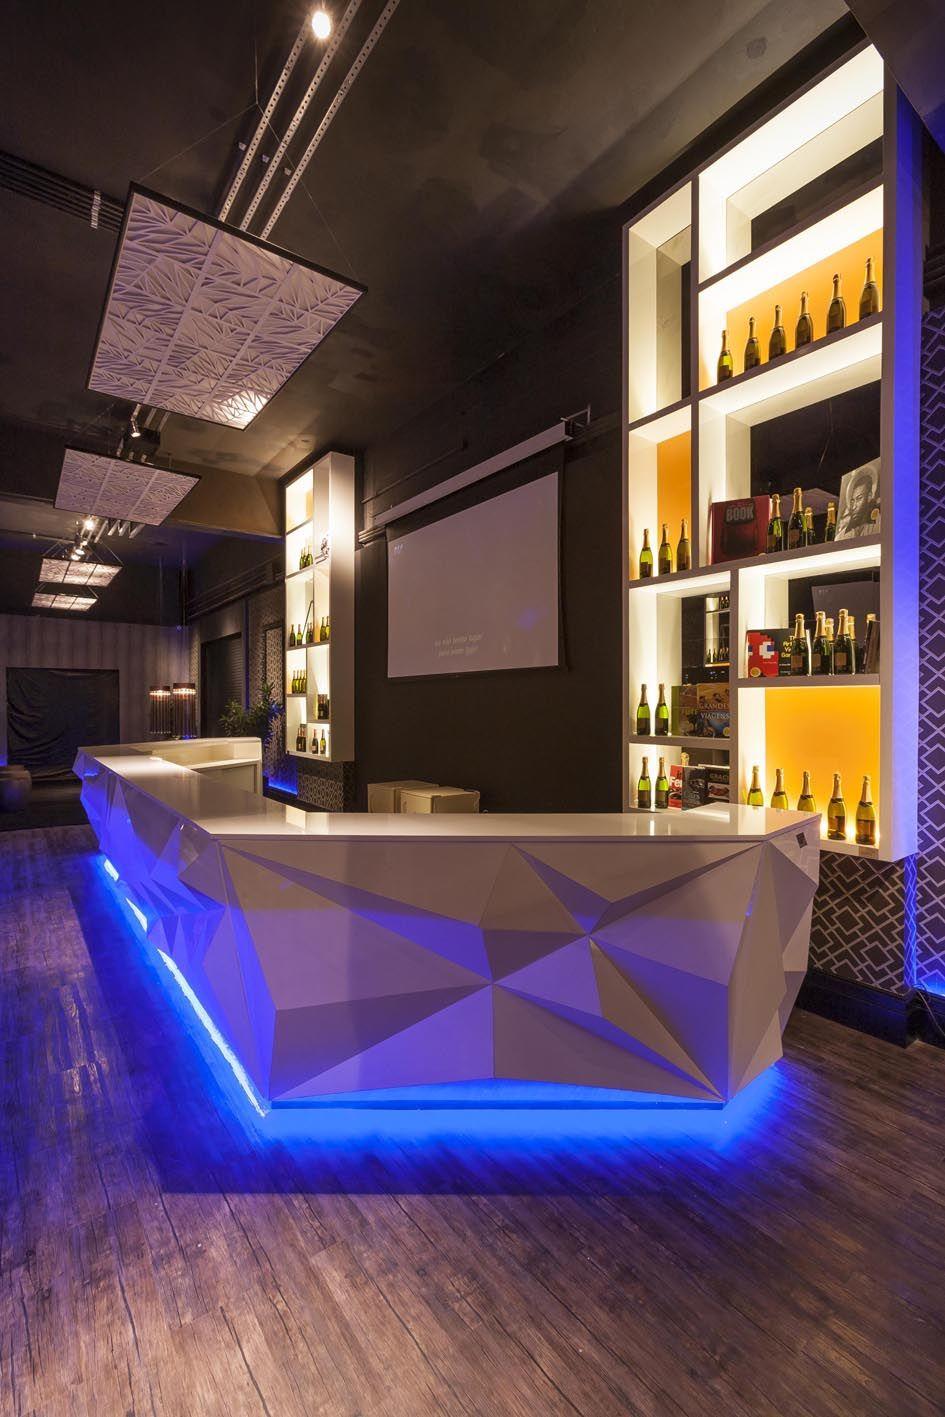 Discoteca bares de casa pinterest discotecas bar y - Discoteca in casa ...